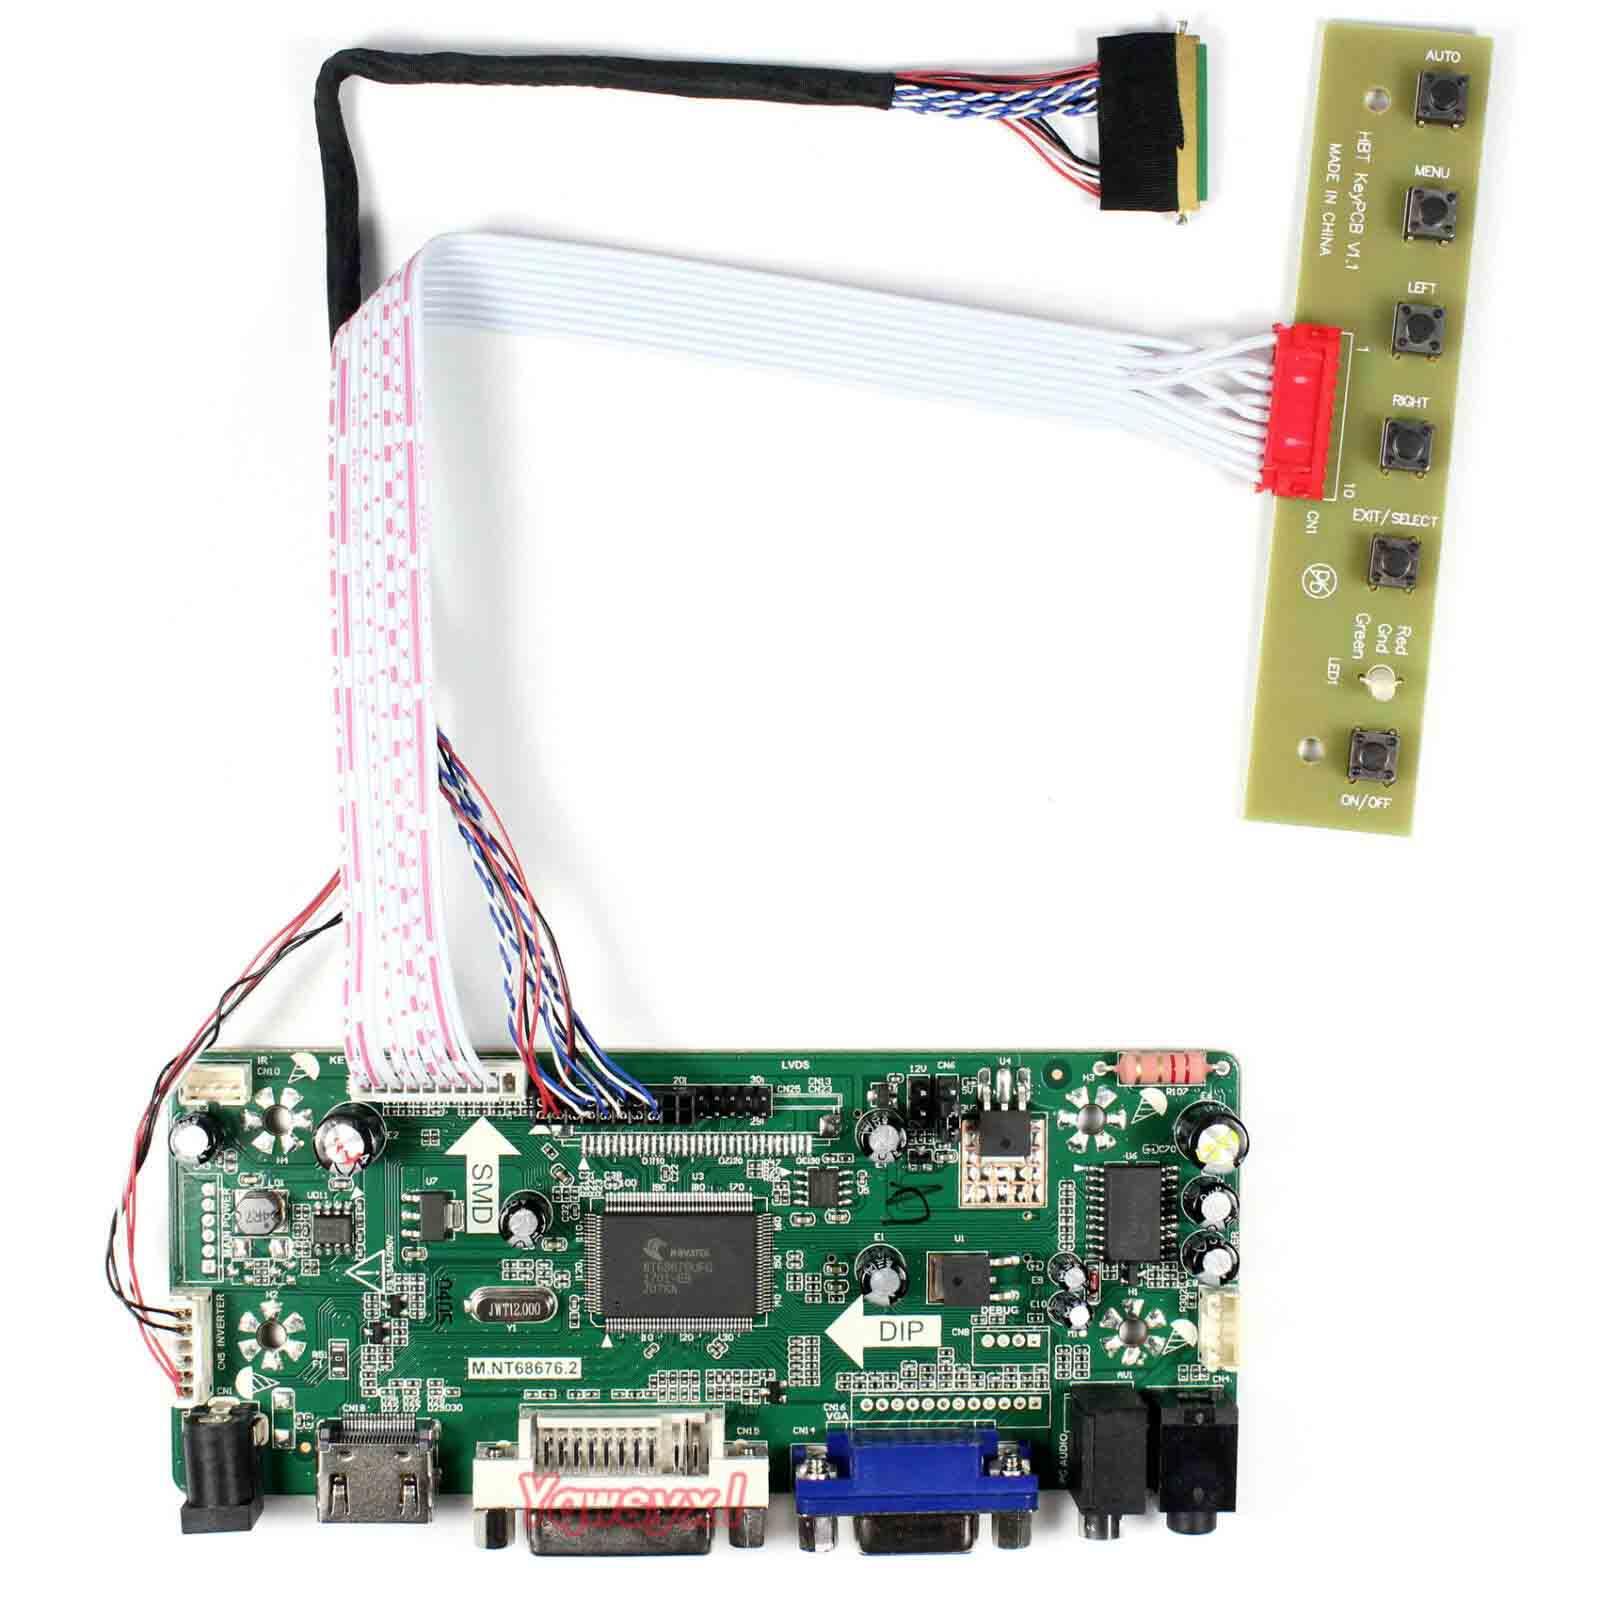 Yqwsyxl Control Board Monitor Kit For N156BGE-L11  HDMI+DVI+VGA LCD LED Screen Controller Board Driver